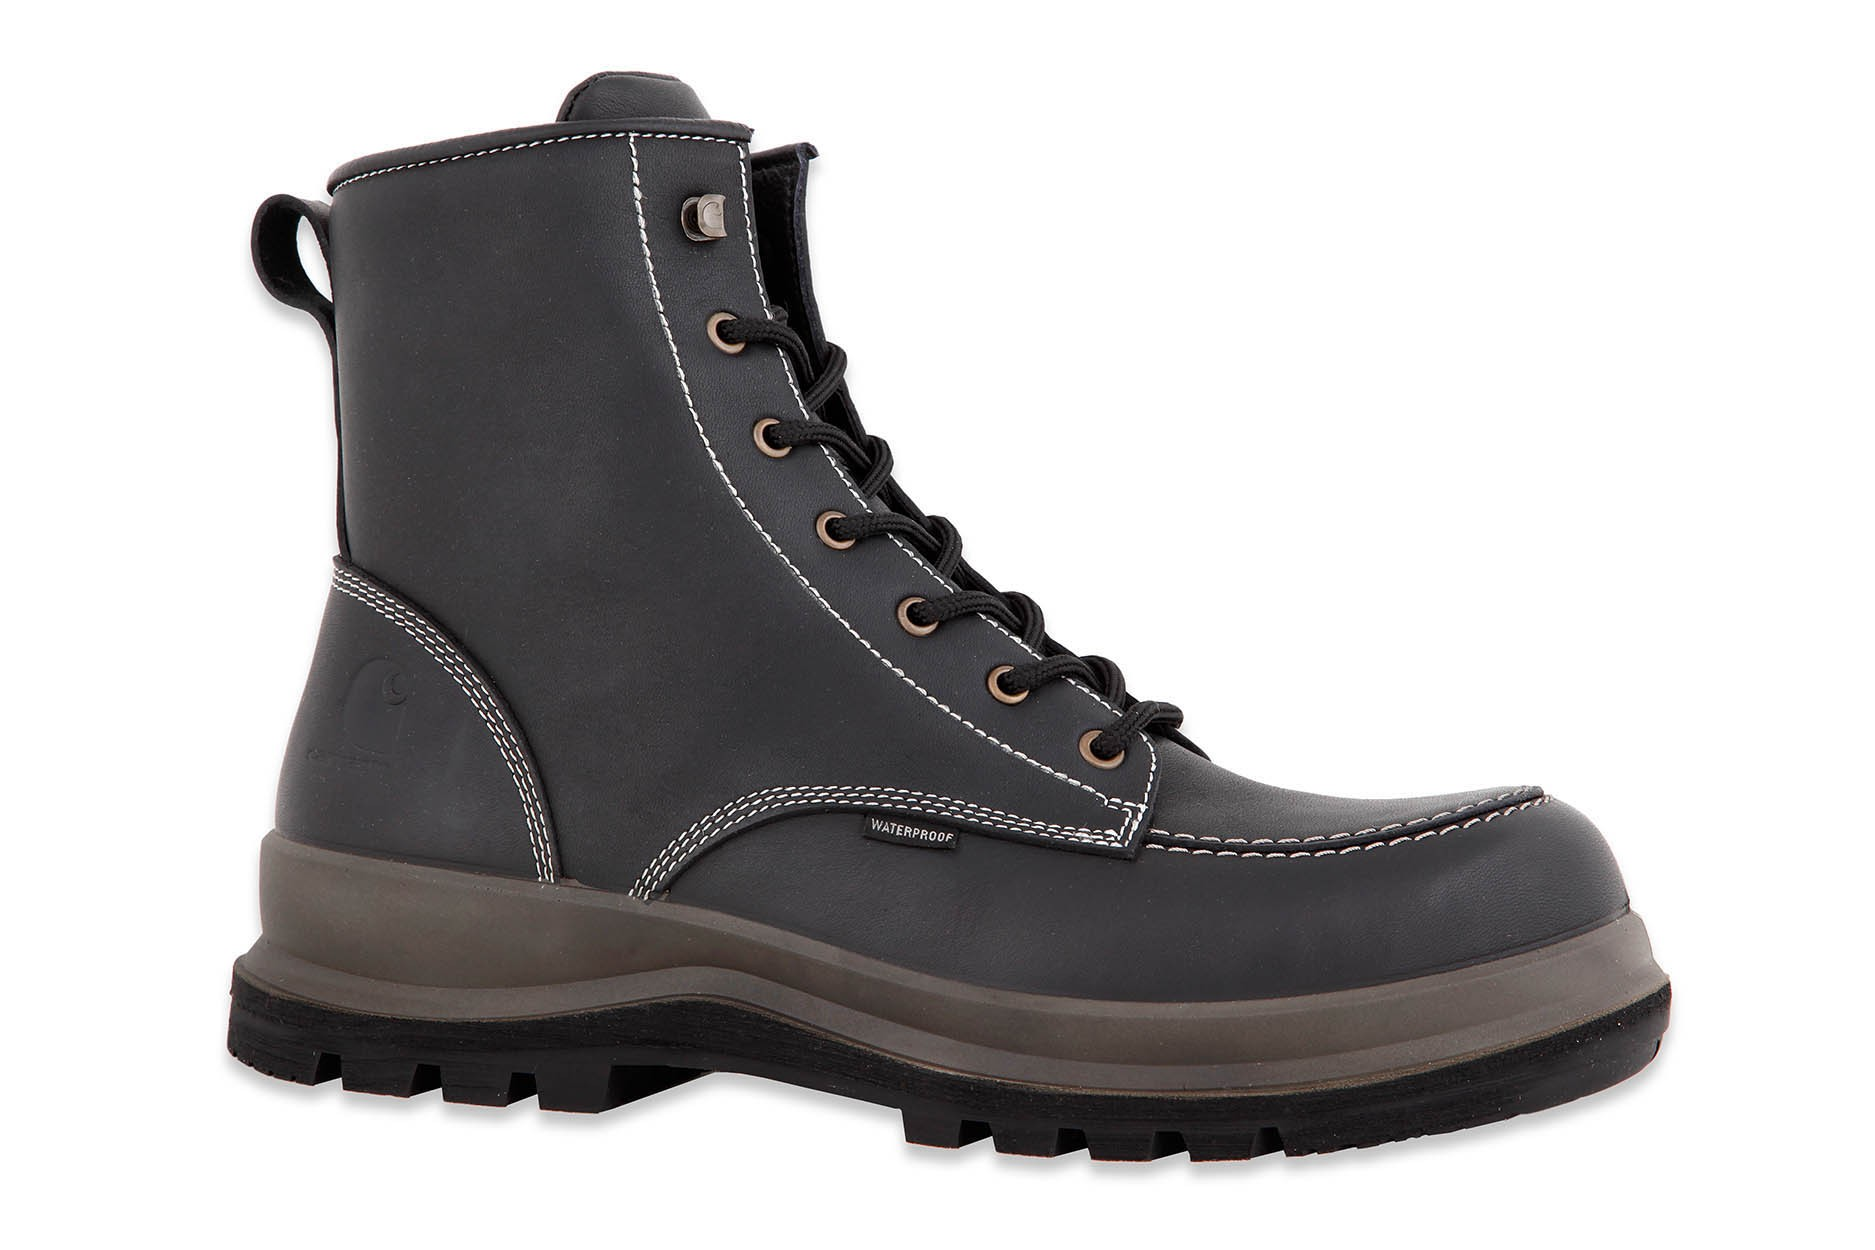 4bf1535ee78c Carhartt F702901 Hamilton S3 Waterproof Wedge Boot - Standard Safety ...